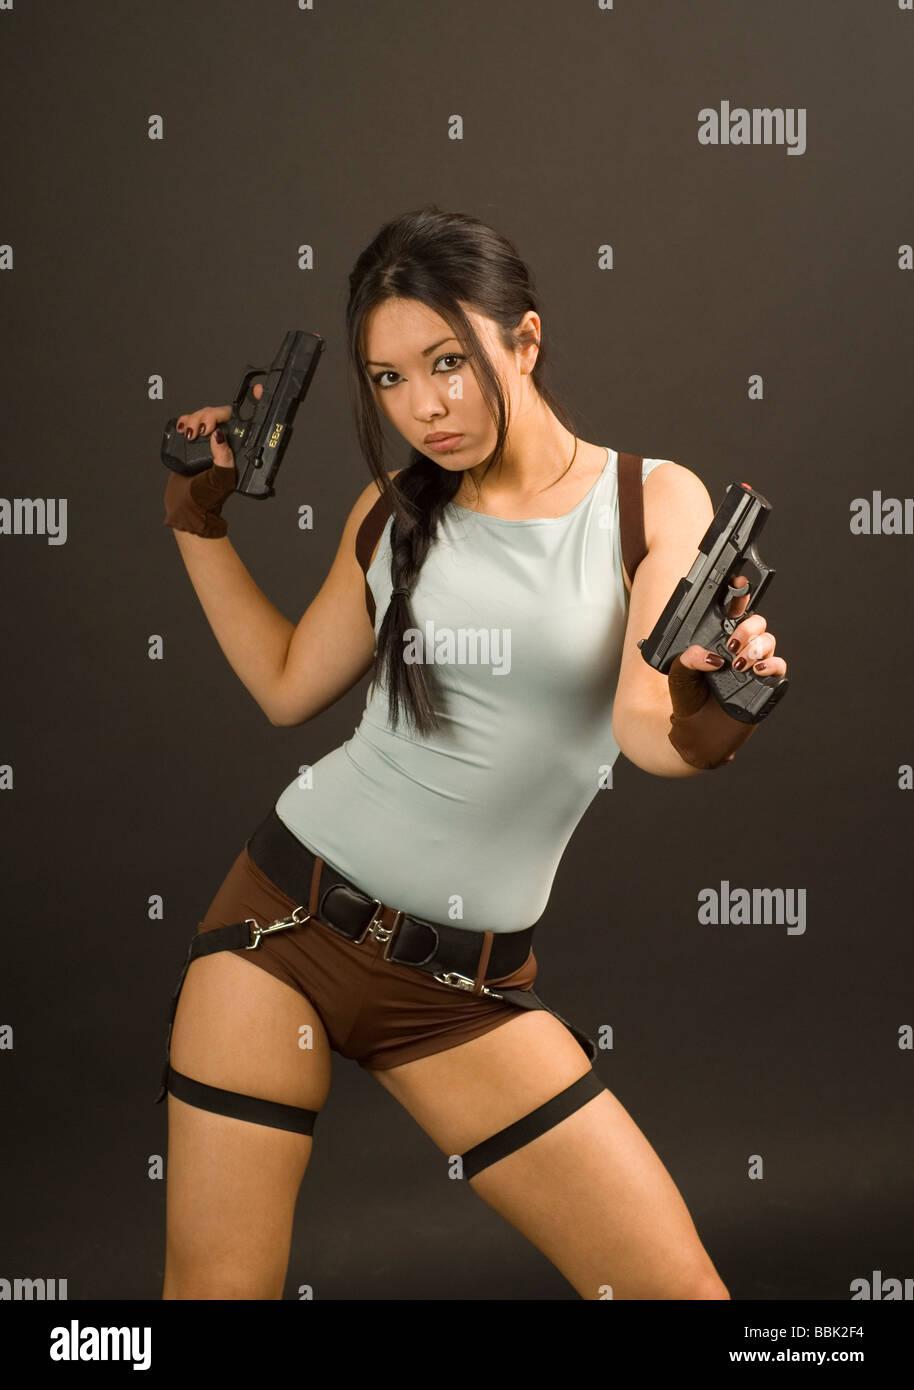 Mädchen In Lara Croft Kostüm Stockfoto Bild 24390664 Alamy